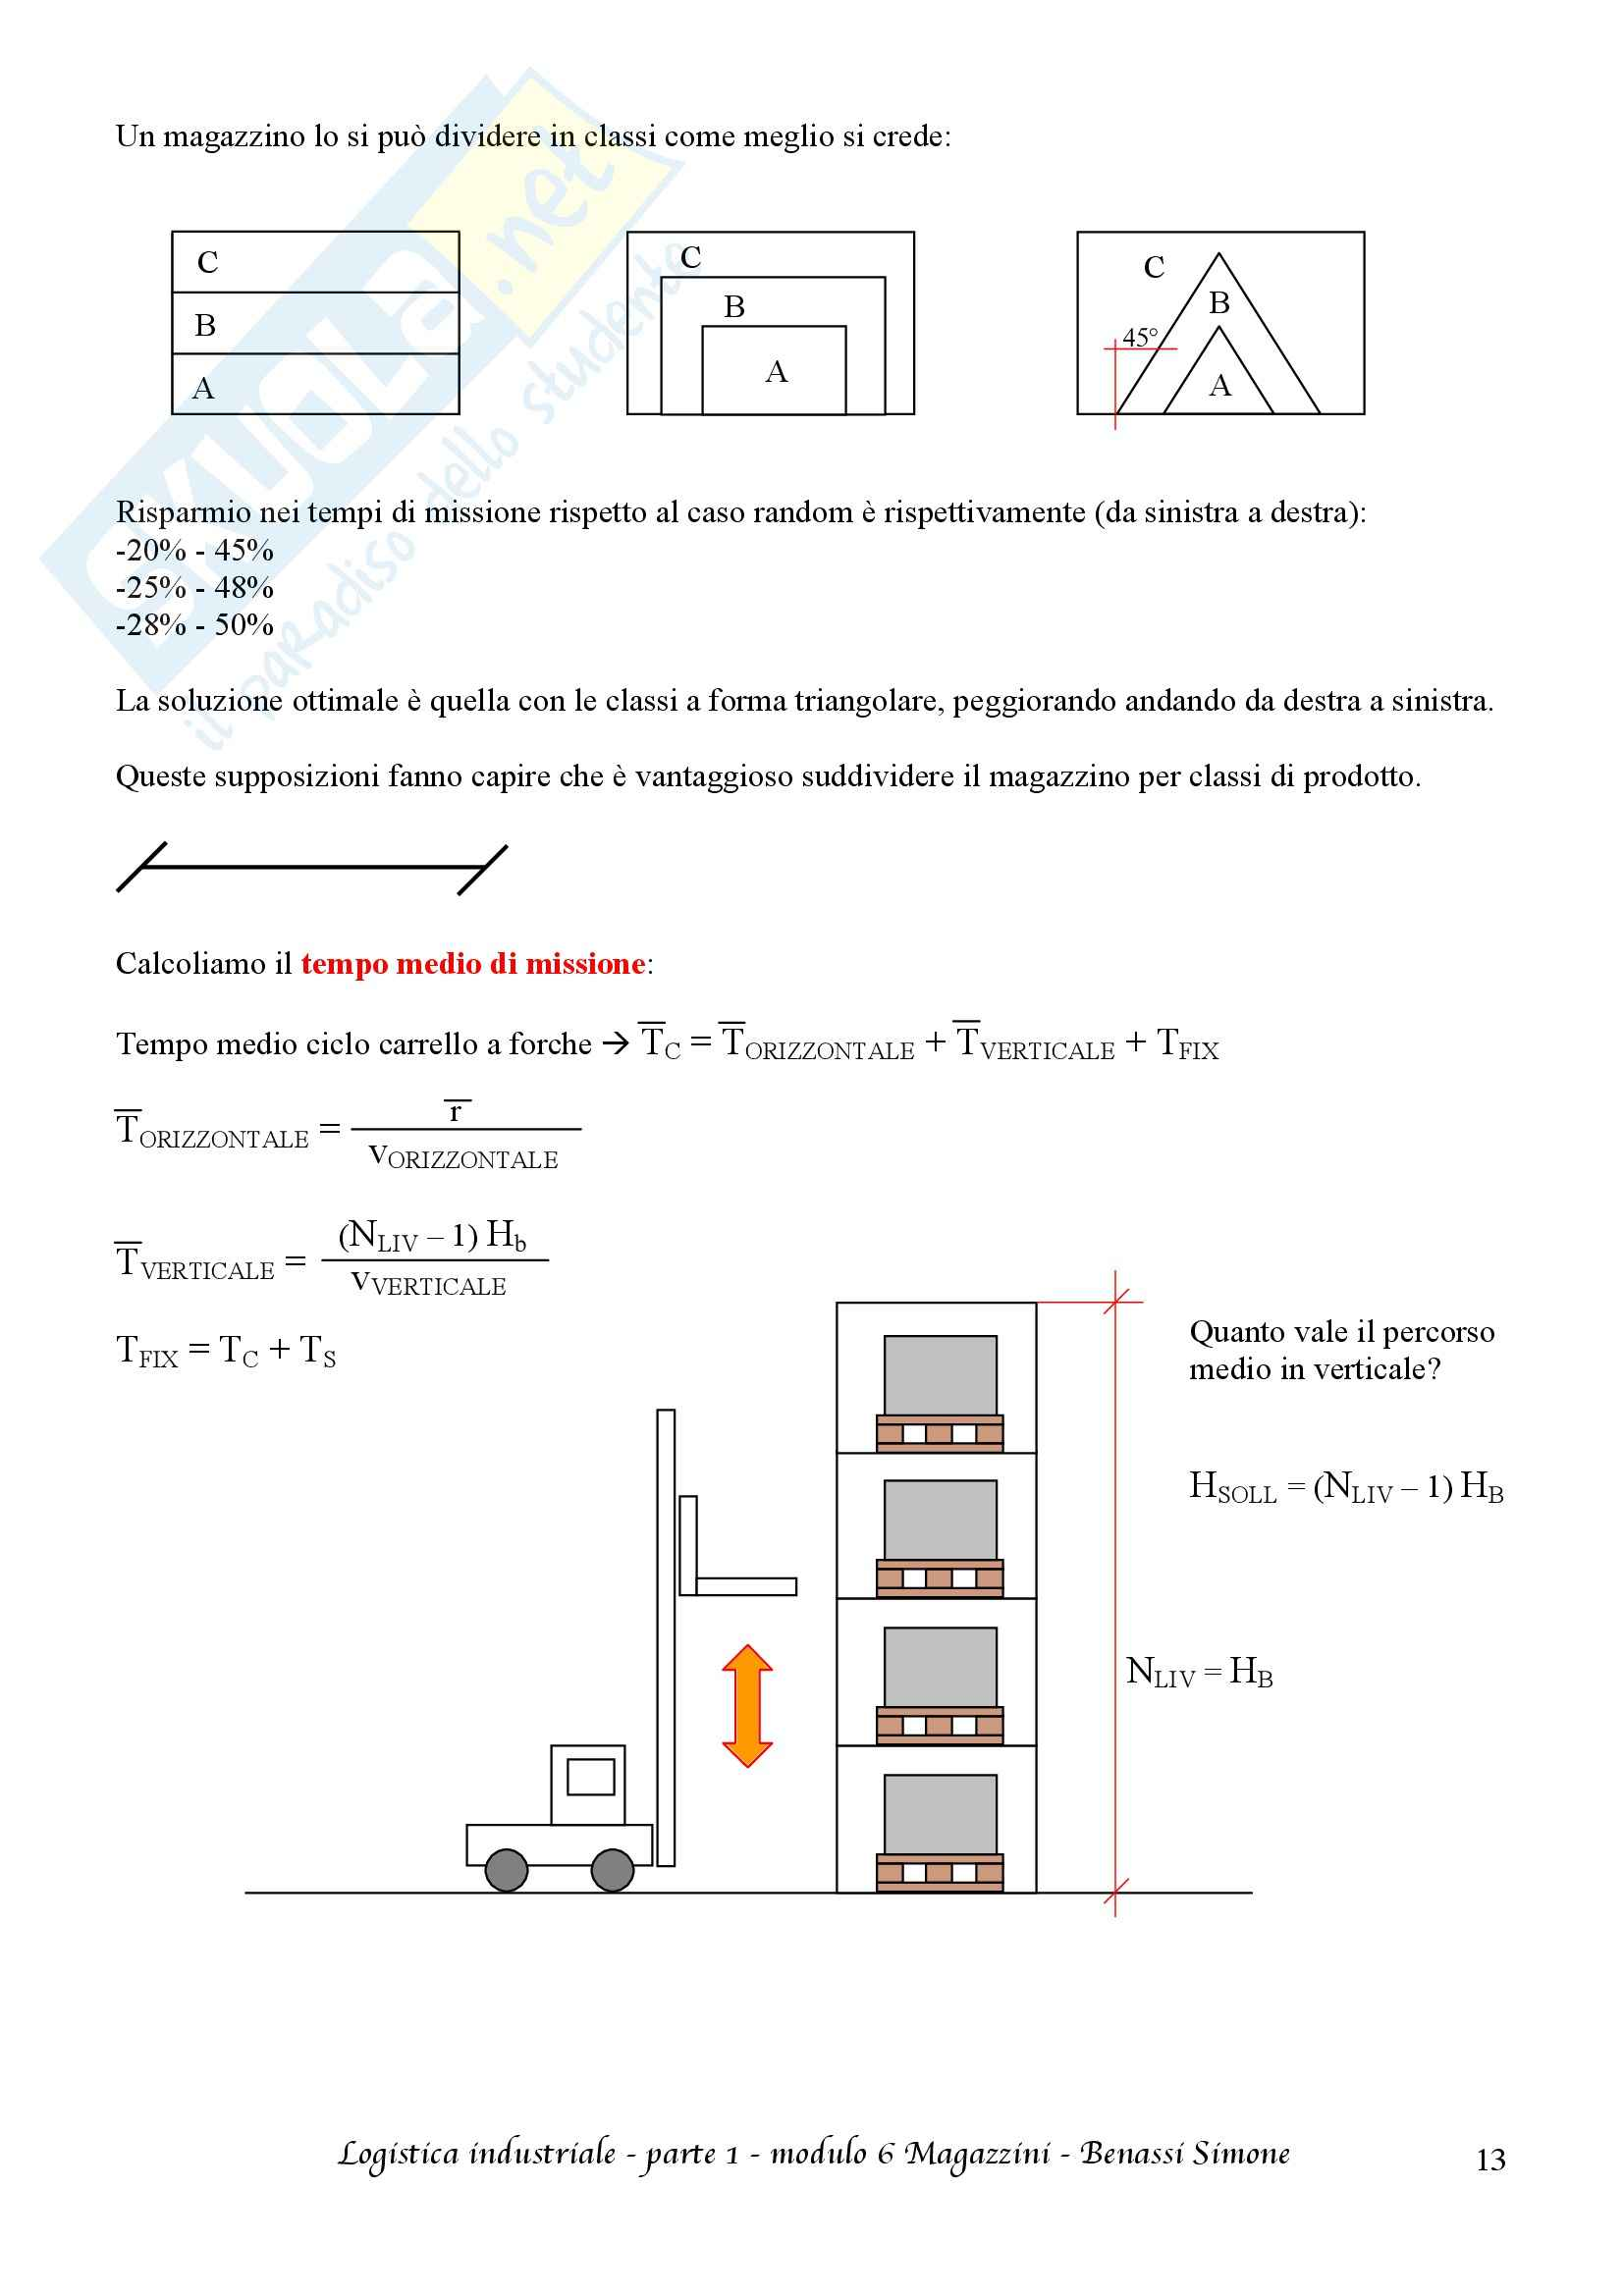 Logistica industriale T-AB - Appunti prima parte Pag. 46